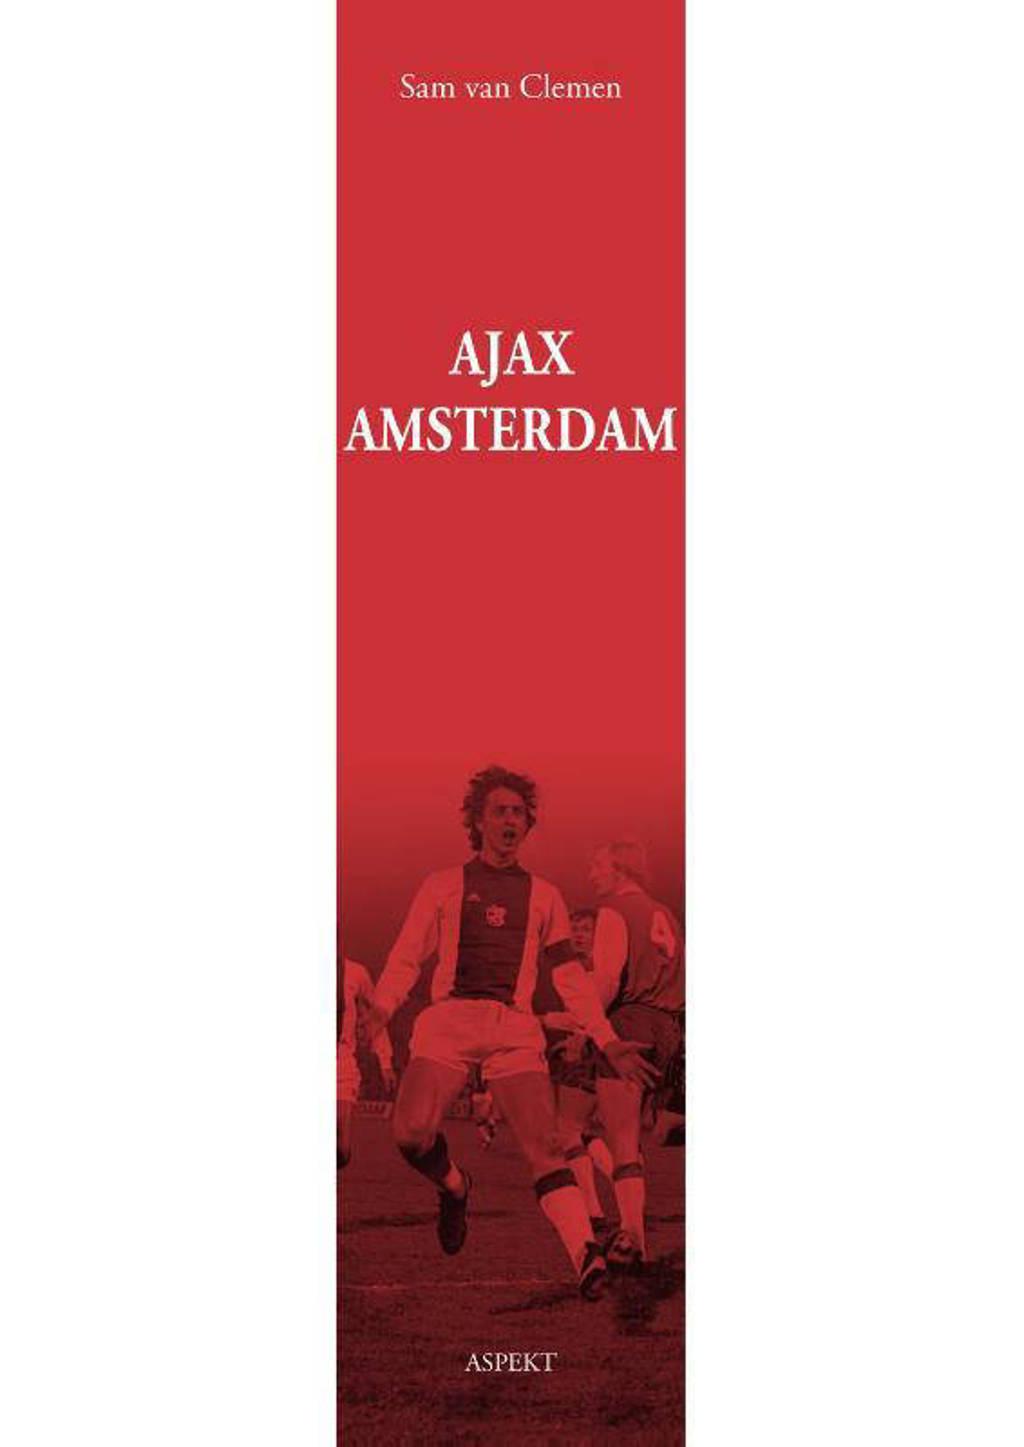 AJAX Amsterdam - Sam van Clemen